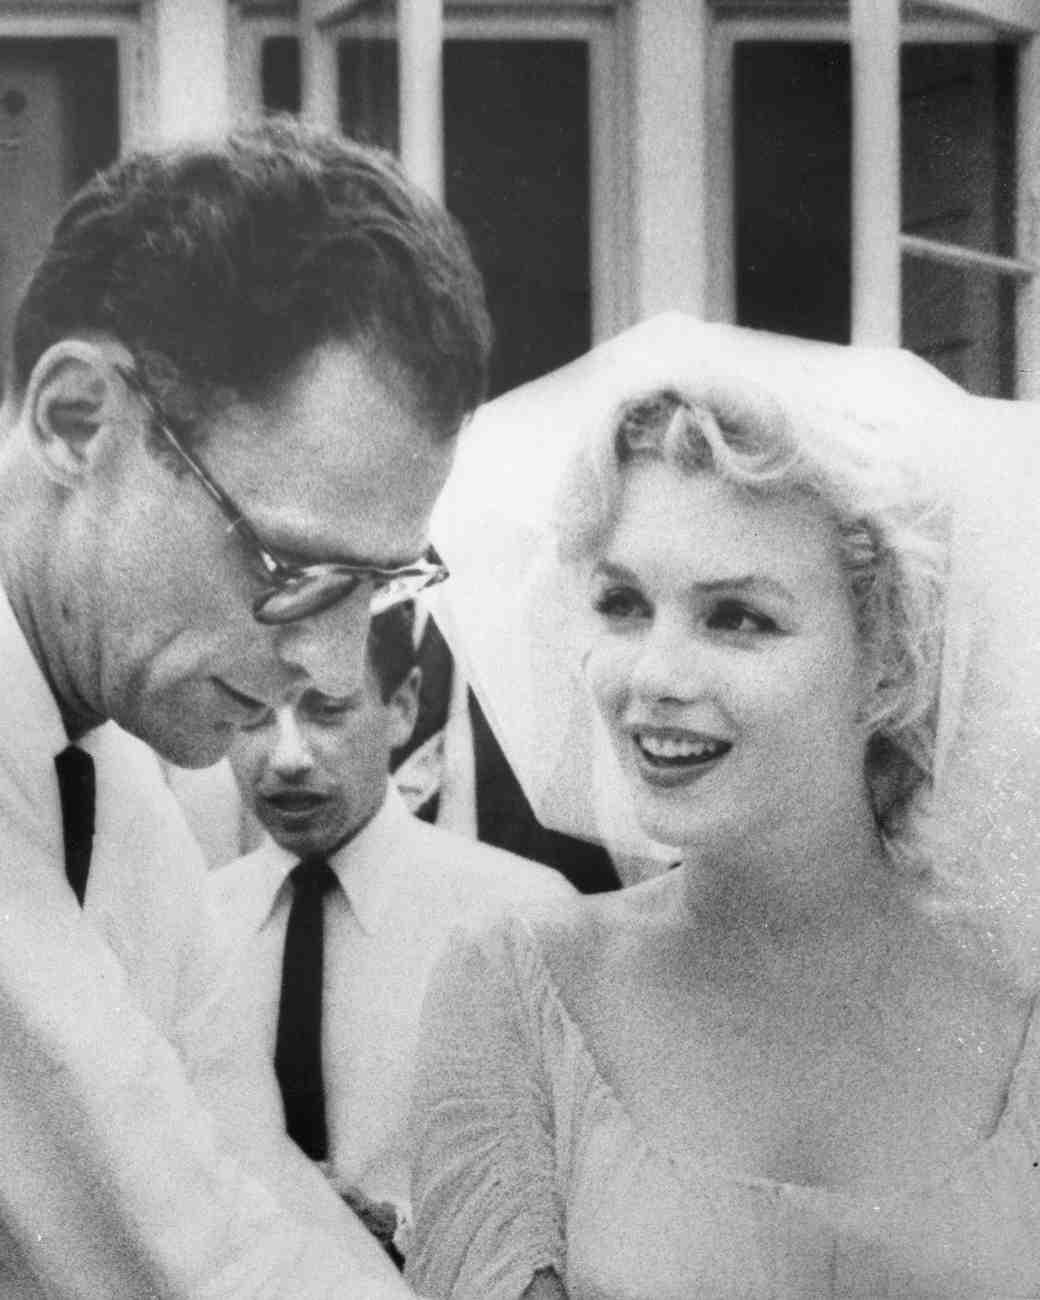 celebrity-brides-veils-marilyn-monroe-arthur-miller-0615.jpg